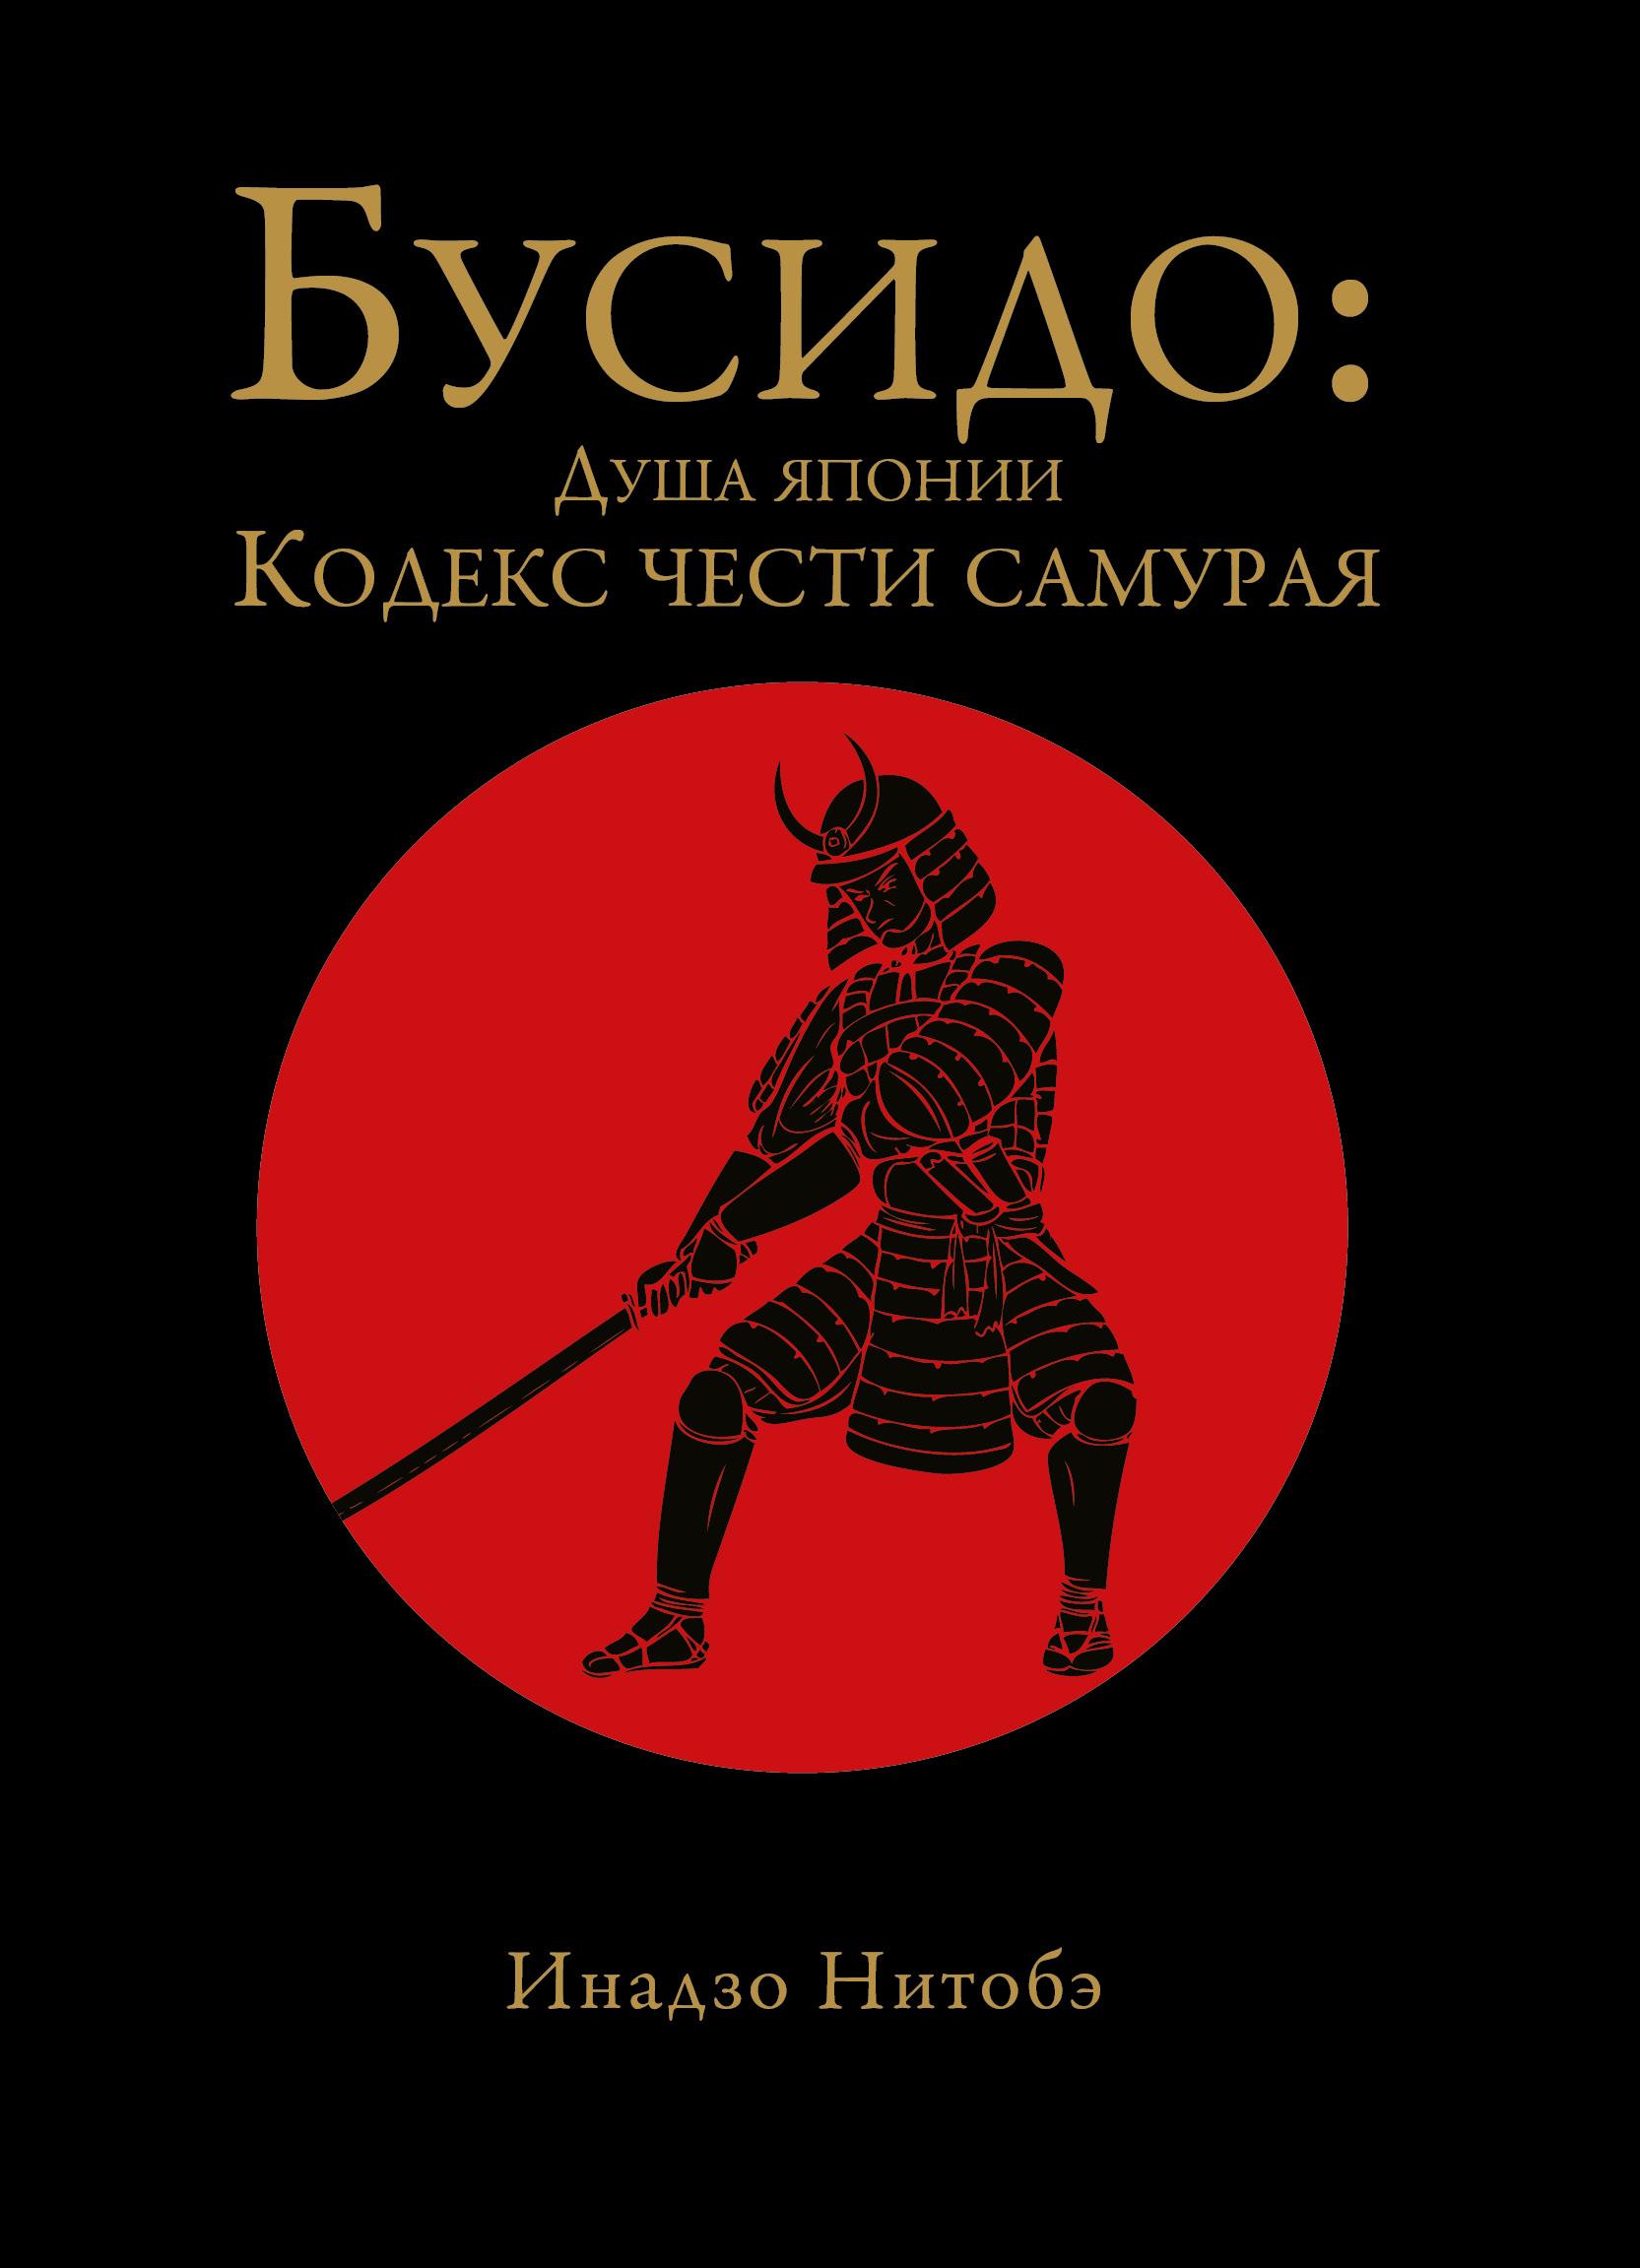 Бусидо: кодекс чести самурая ( Нитобэ И.  )